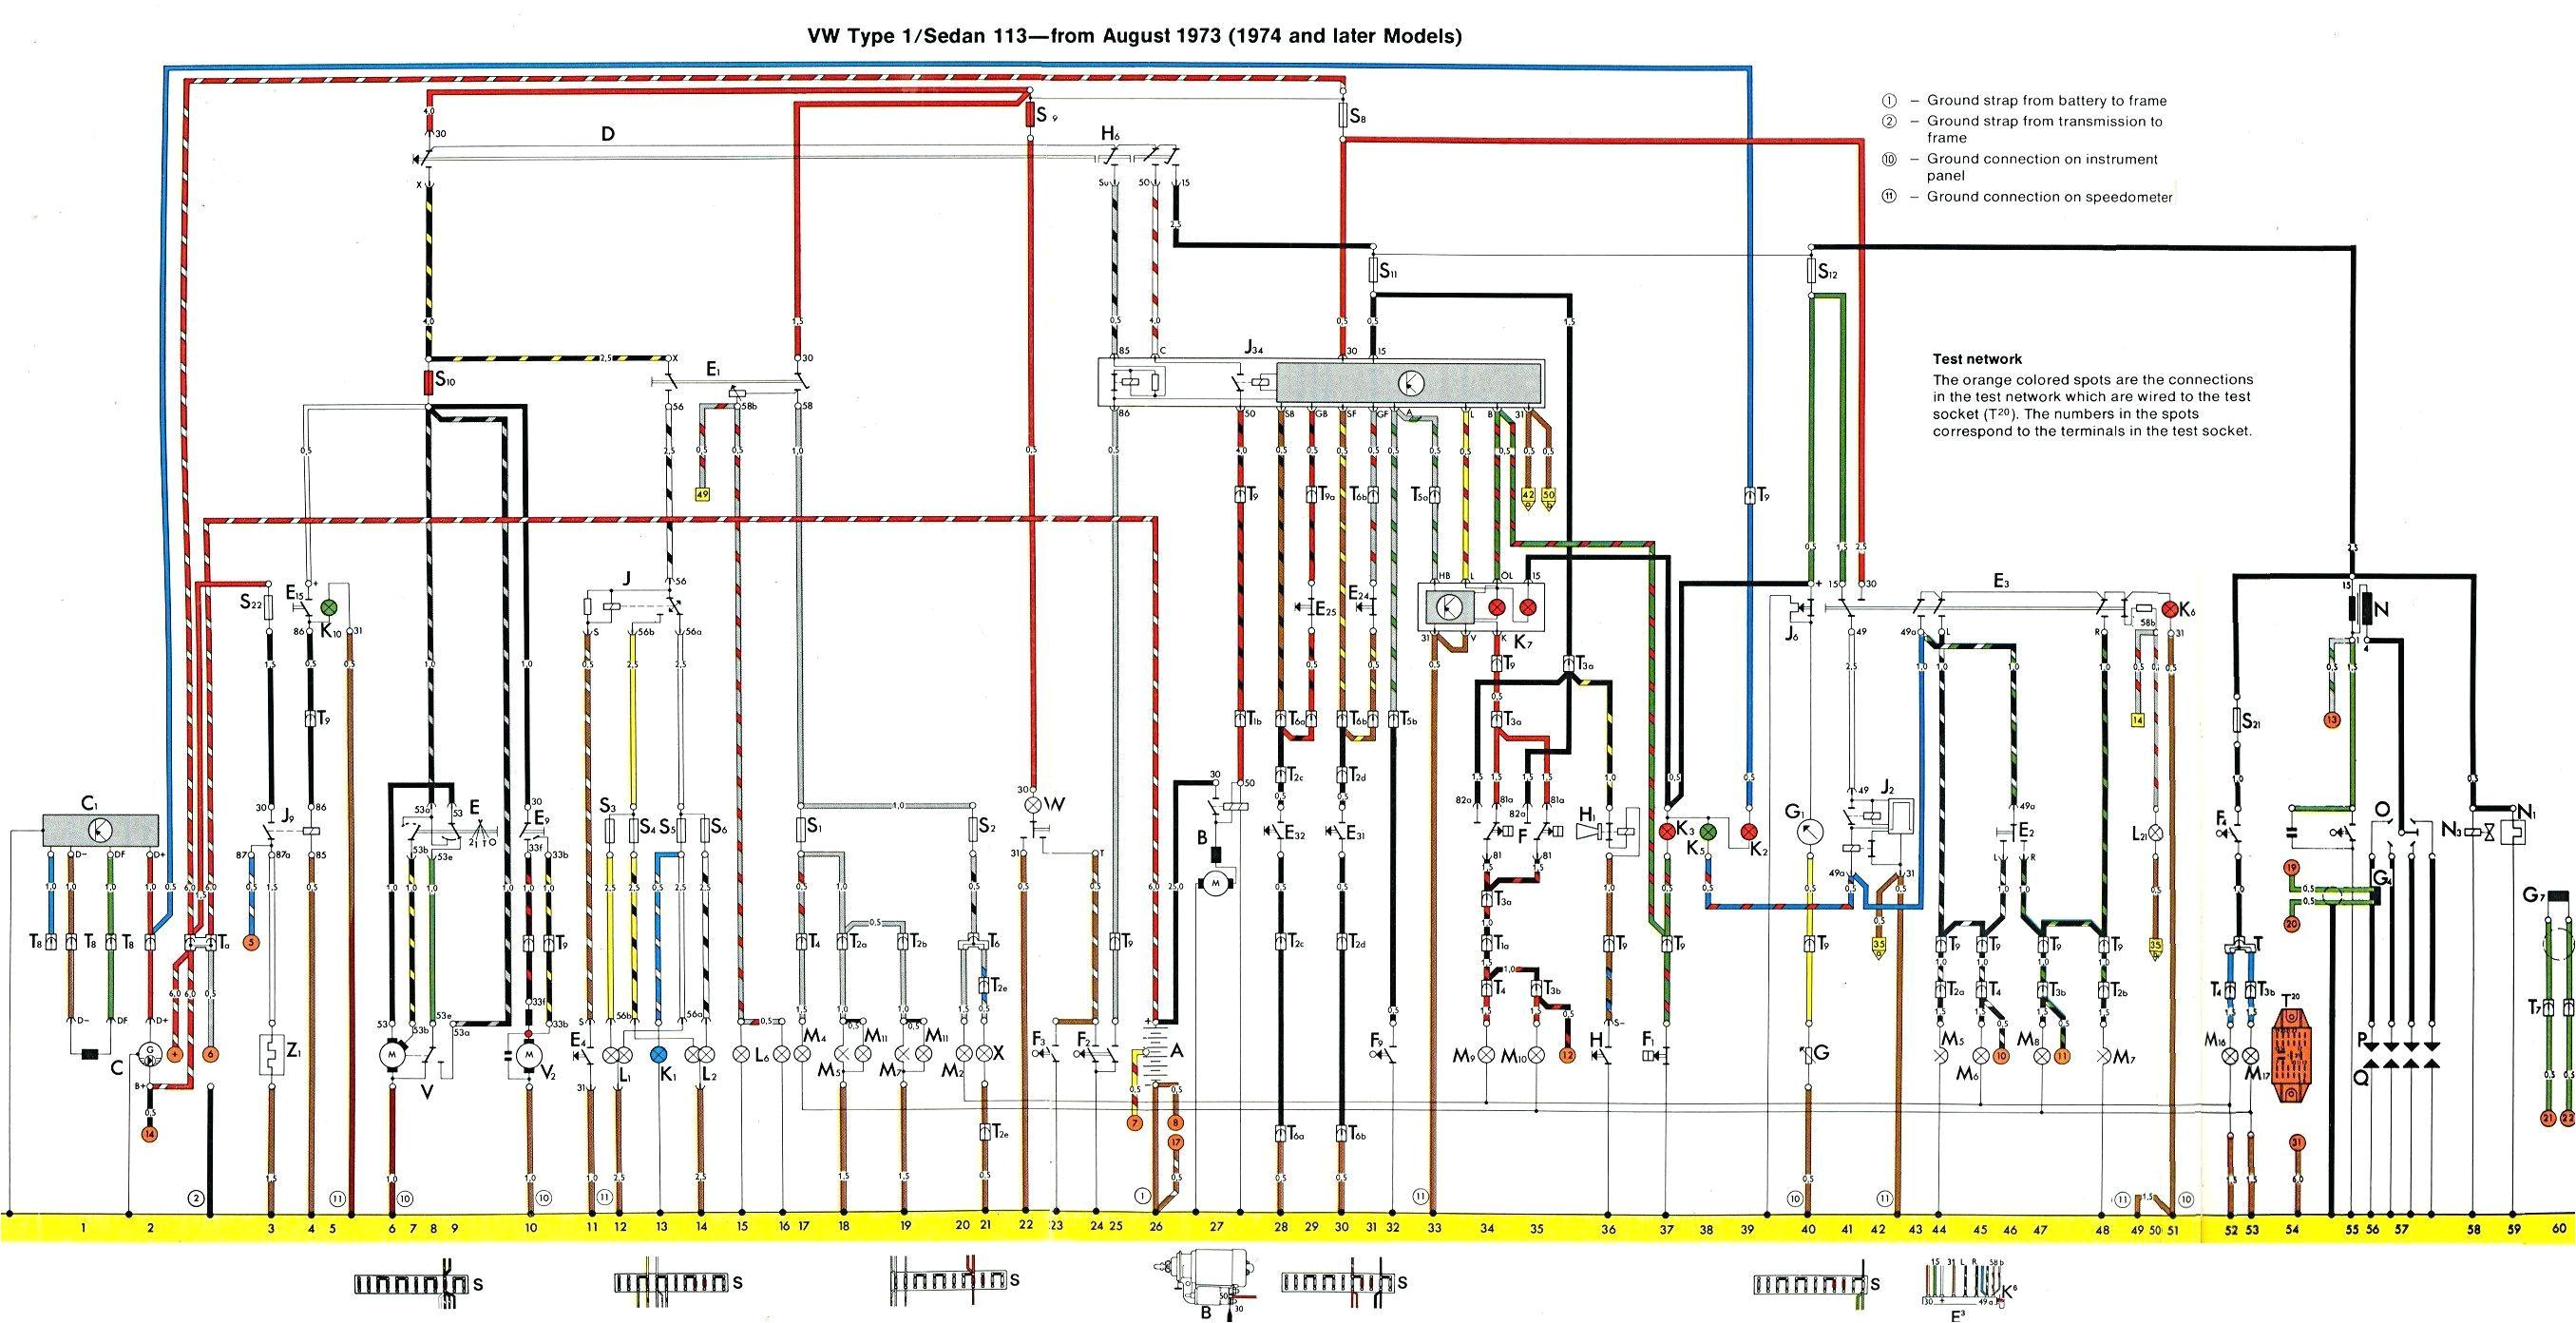 2003 beetle fuse diagram wiring diagram article review 2003 beetle fuse diagram